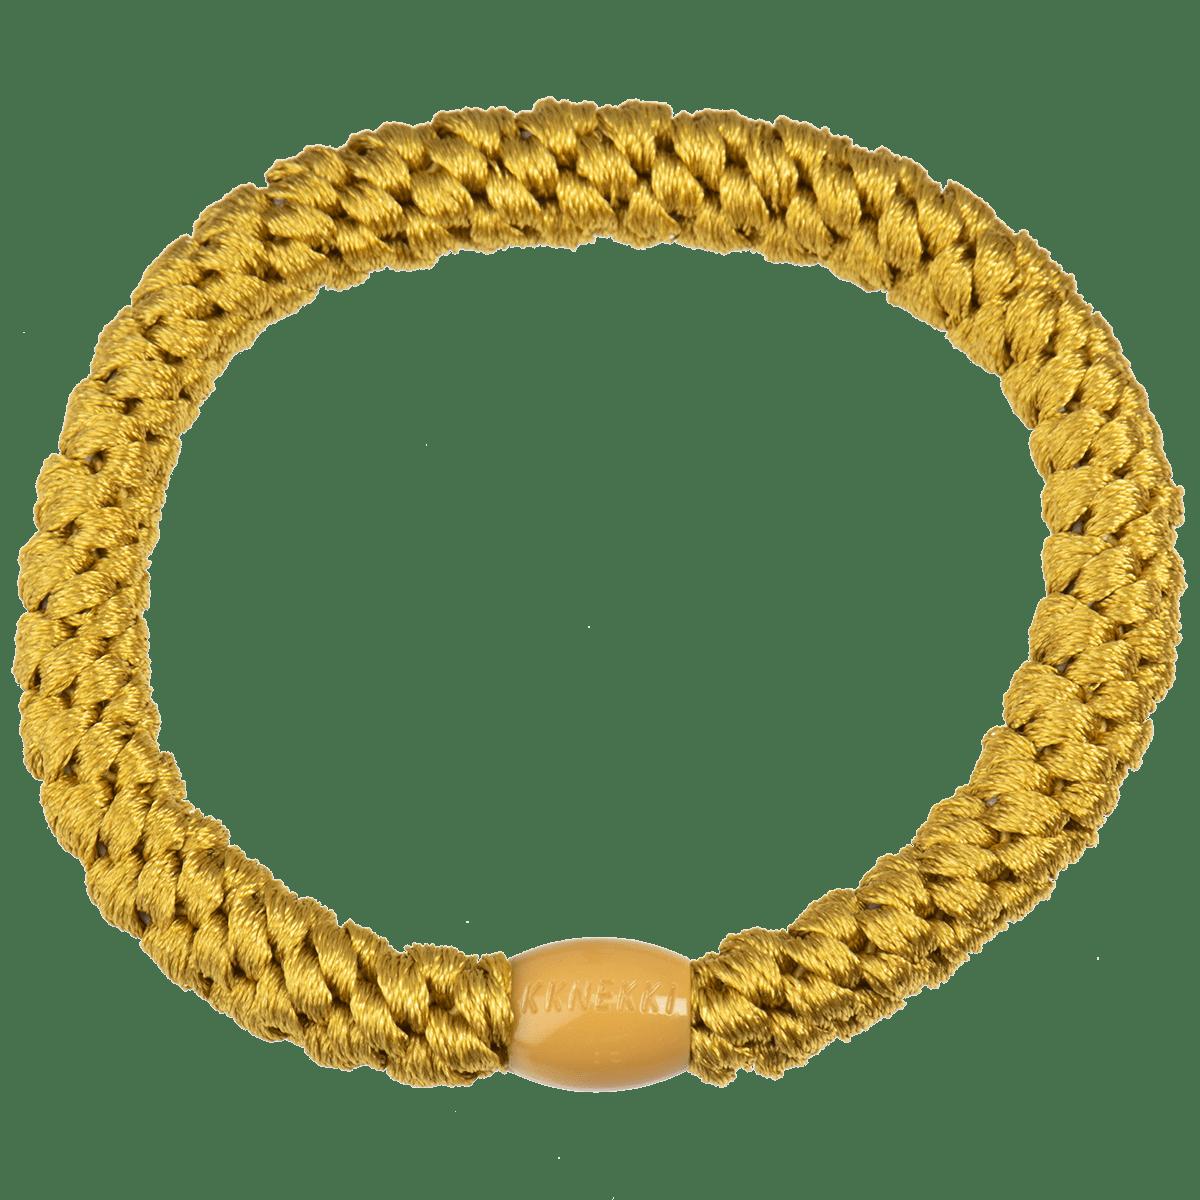 Haargummi / Armband - Green gold 5104 - KKNEKKI